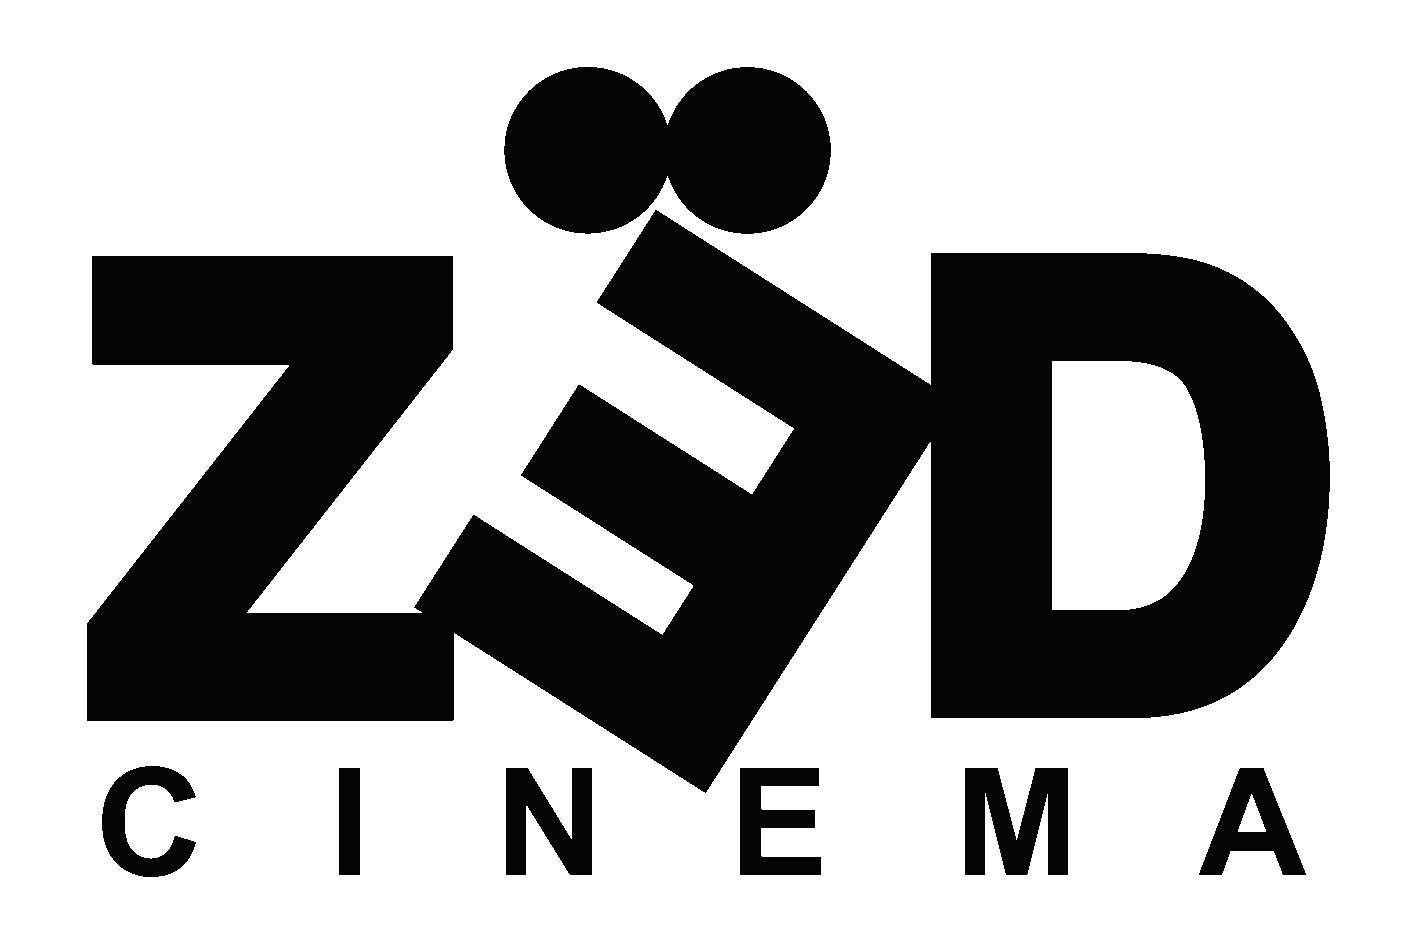 cinemazed_20logo